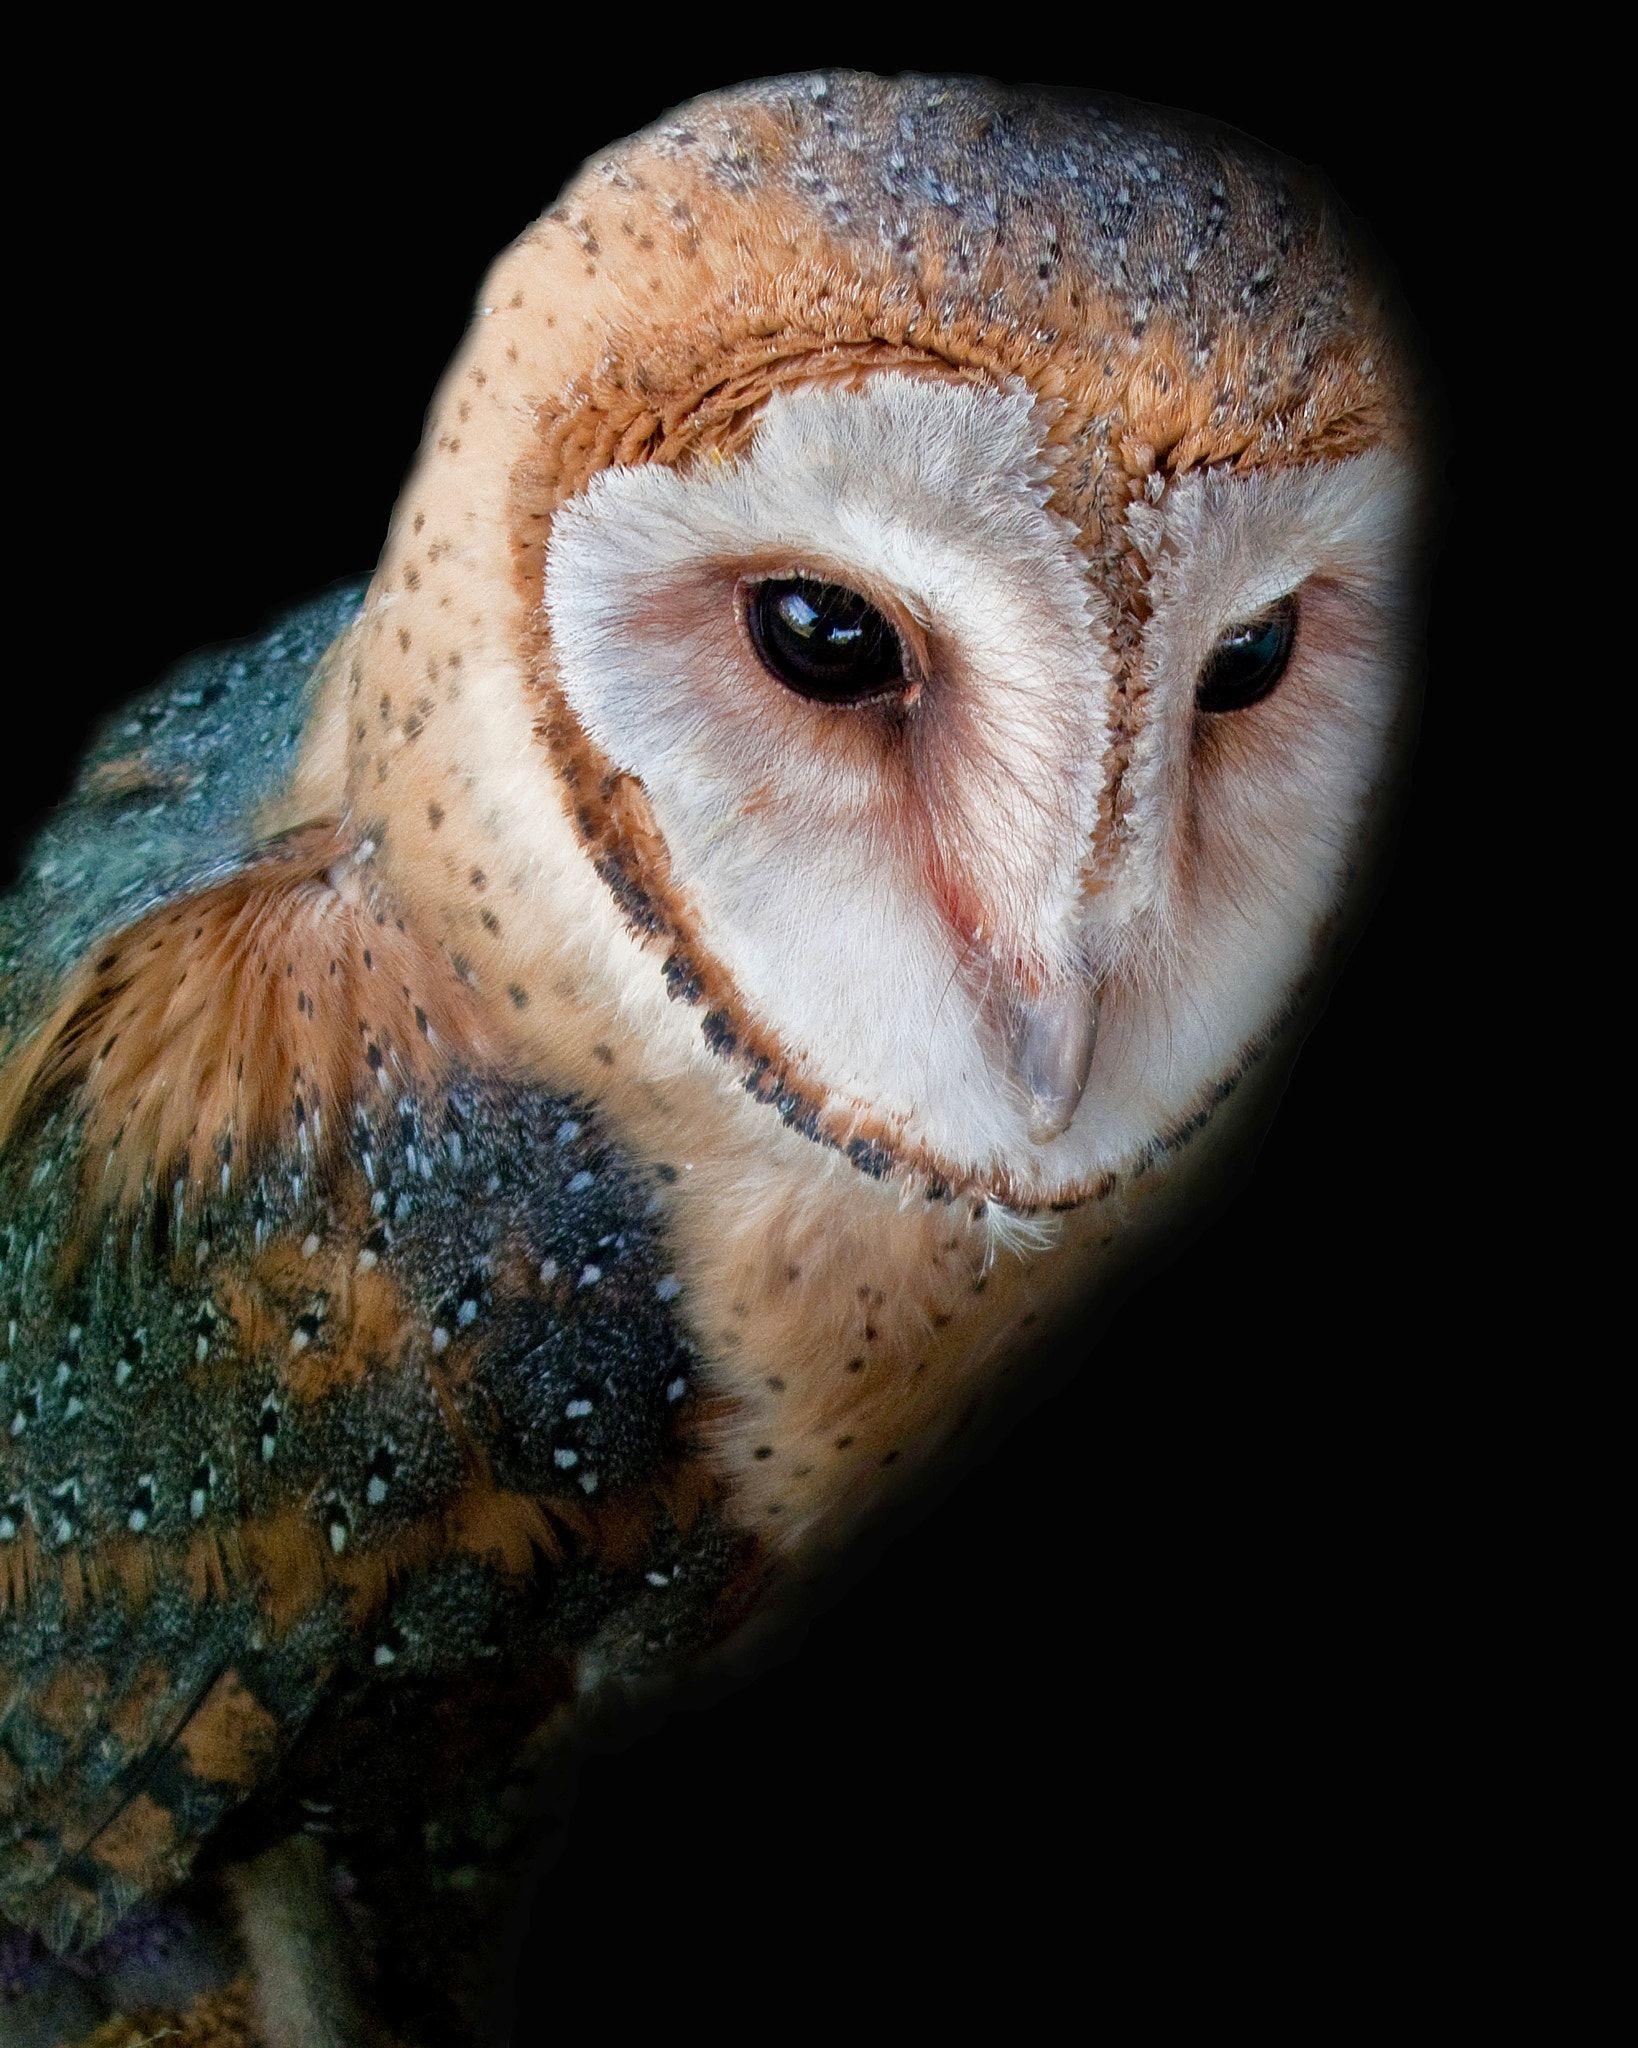 Barn Owl Barn owl, Owl pet, Owl species